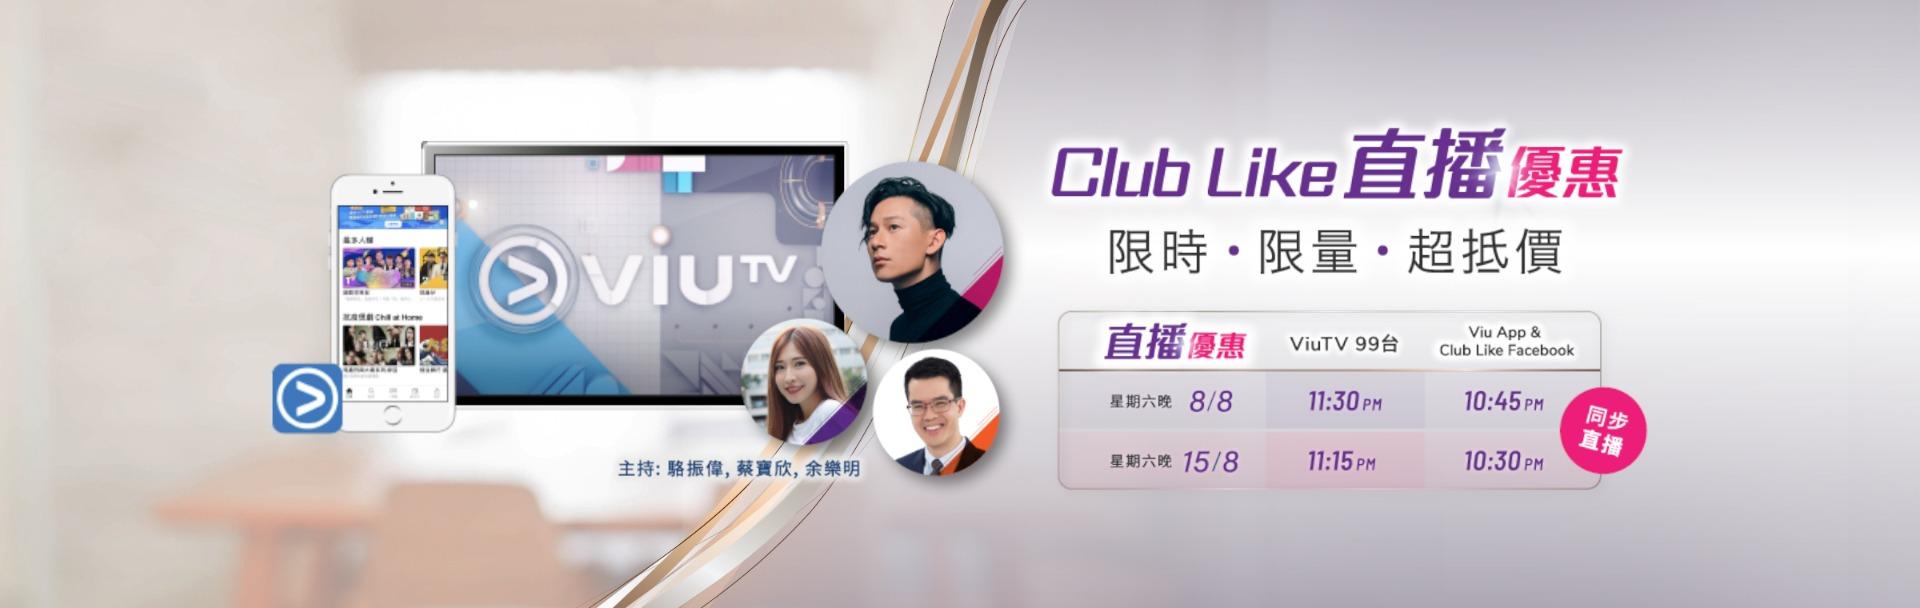 Club Like 時限直播熱賣